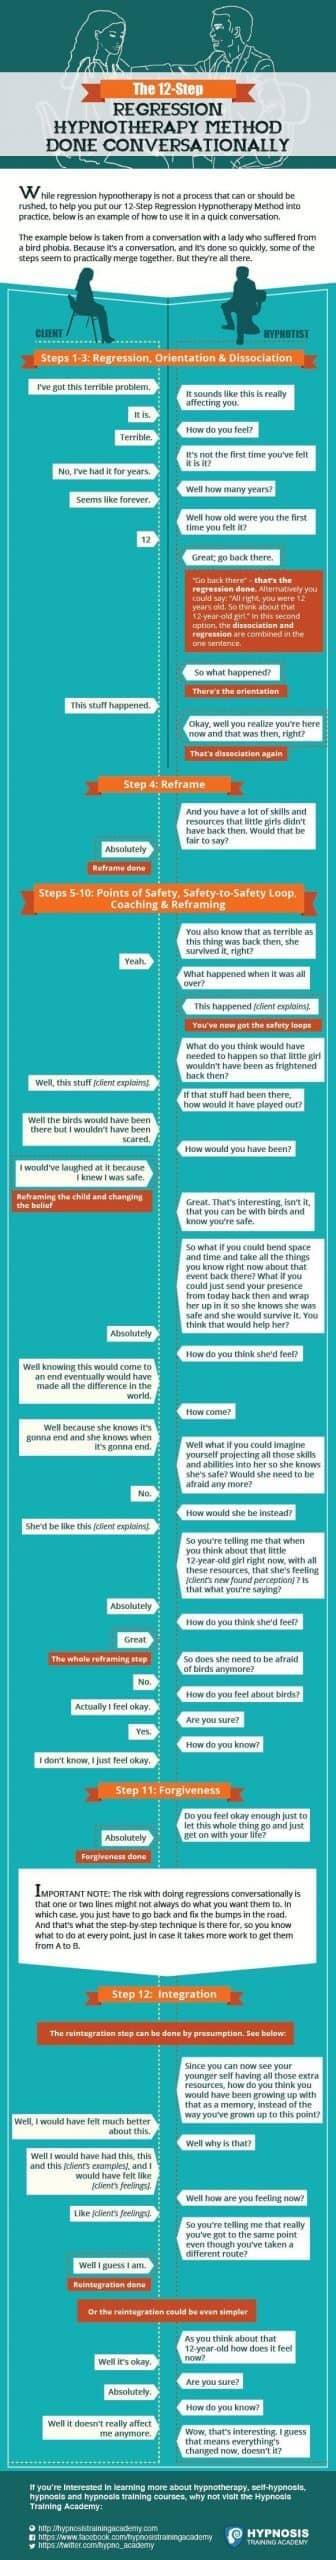 Regression Hypnotherapy Method Done Conversationally